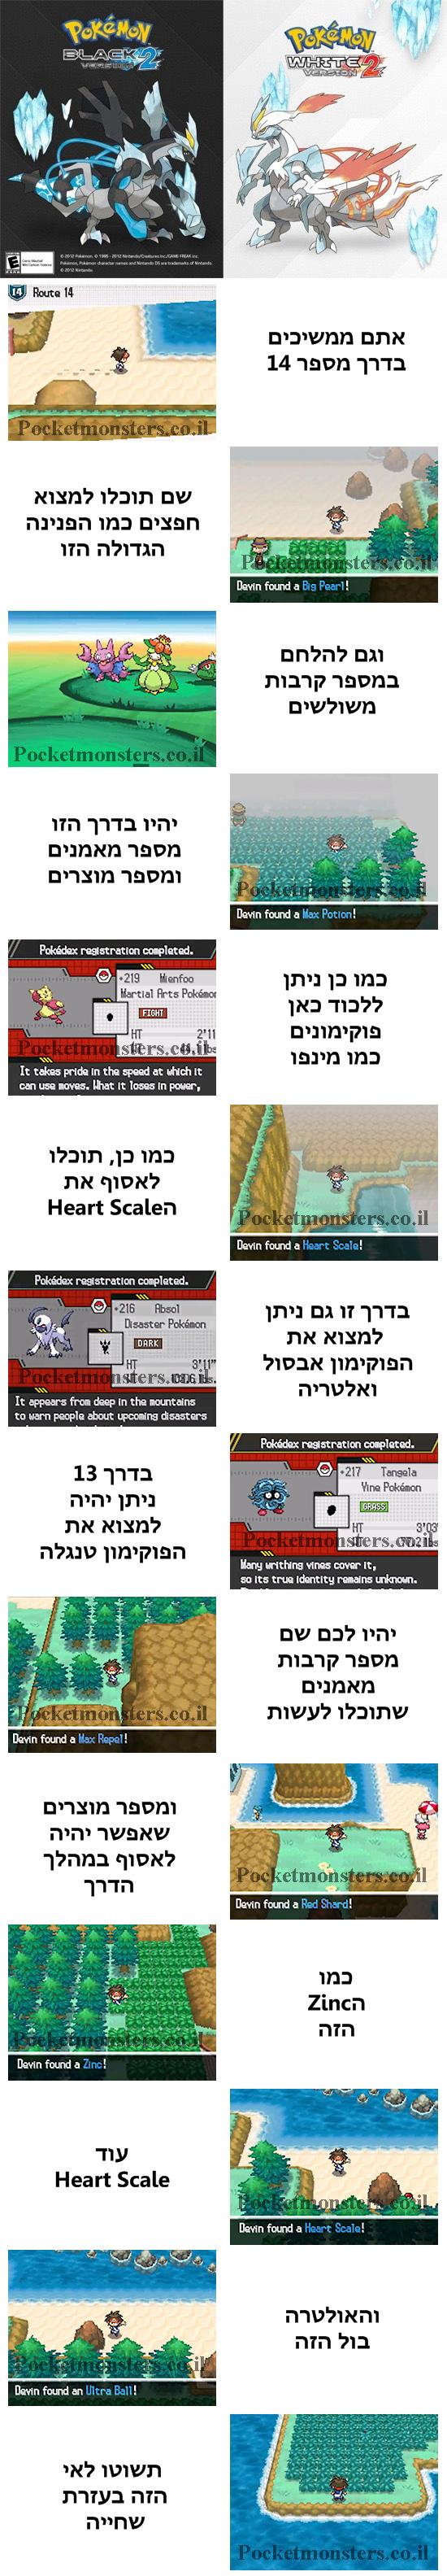 http://pocketmonsters.co.il/wp-content/uploads/2013/08/1.jpg